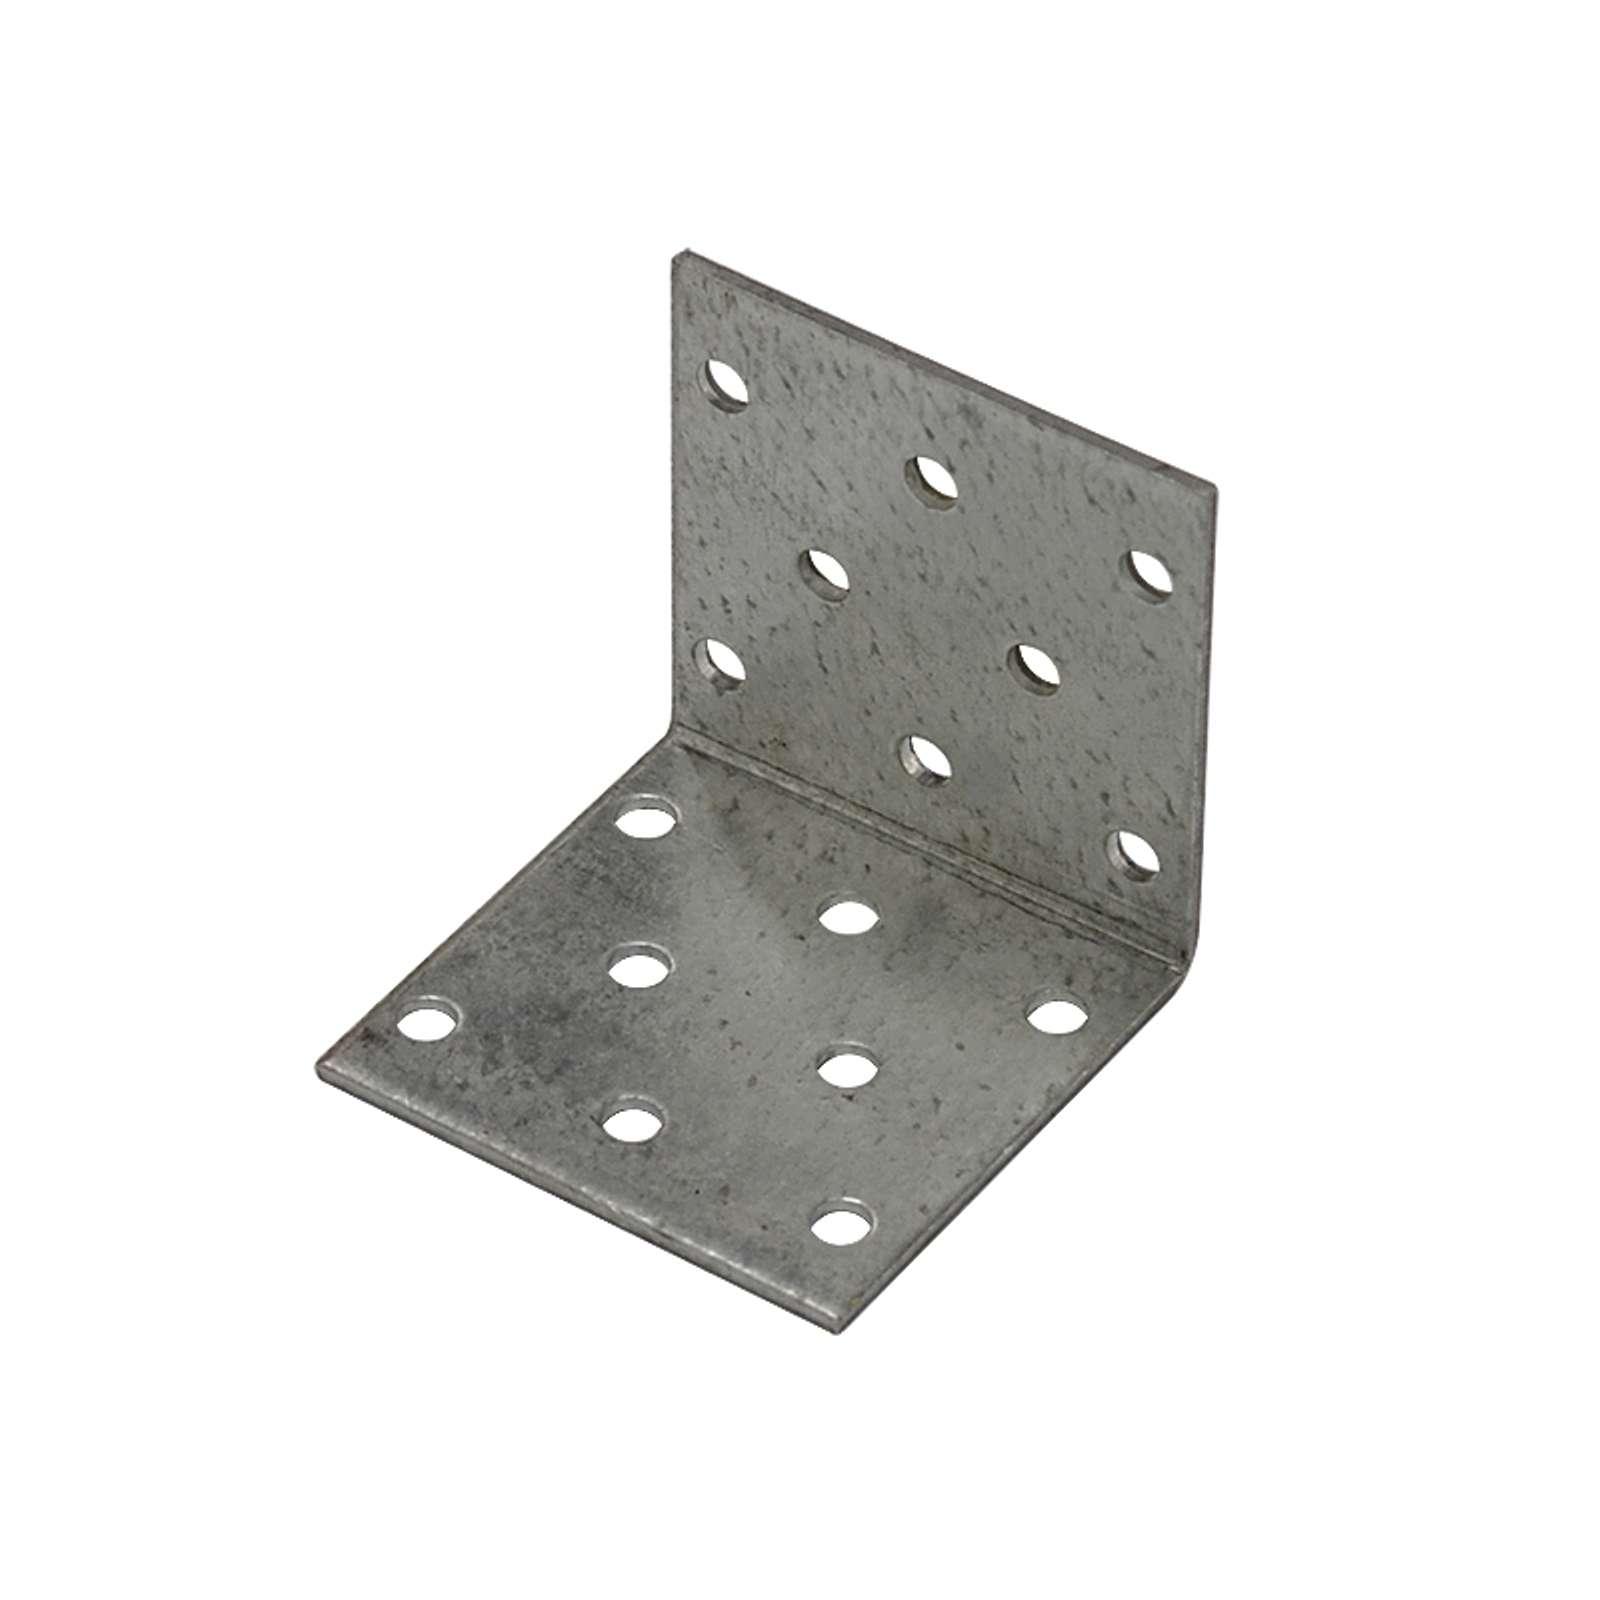 Уголок крепежный равносторонний KUR 50x50x50 (200 шт в УП, БЕЗ ШК)